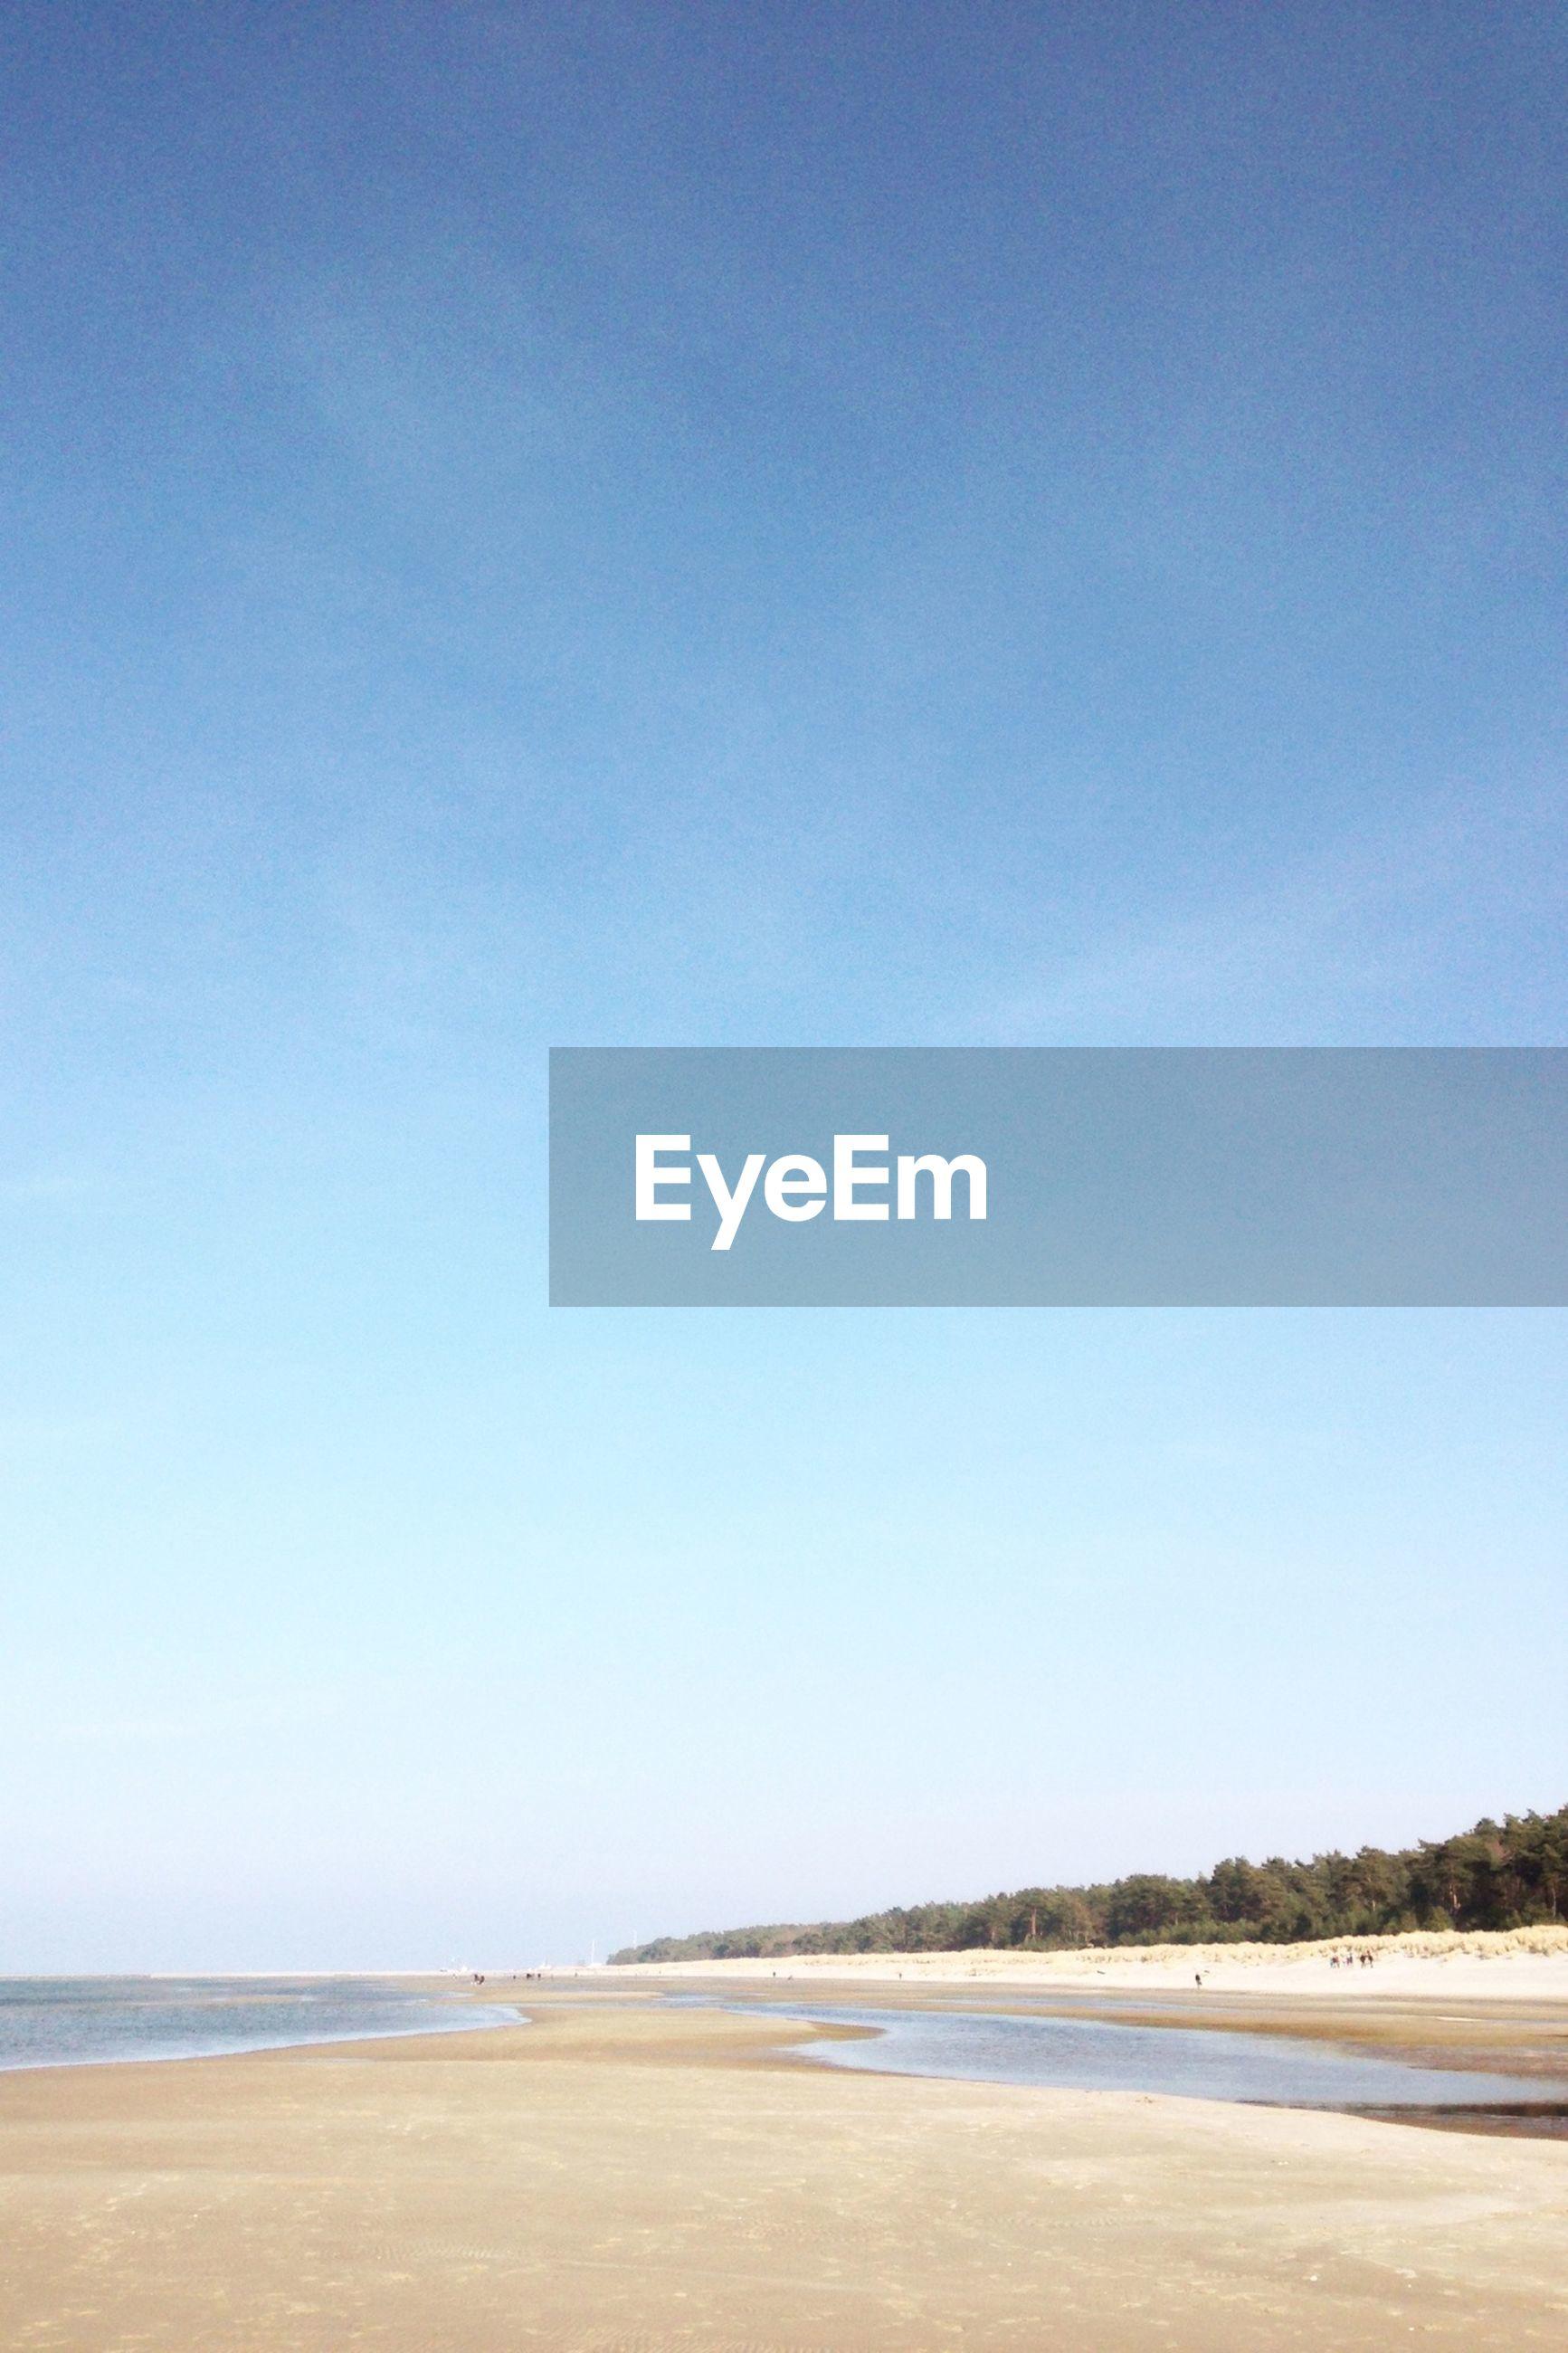 beach, sea, water, sand, tranquil scene, tranquility, shore, clear sky, scenics, blue, copy space, horizon over water, beauty in nature, nature, coastline, idyllic, sky, non-urban scene, calm, day